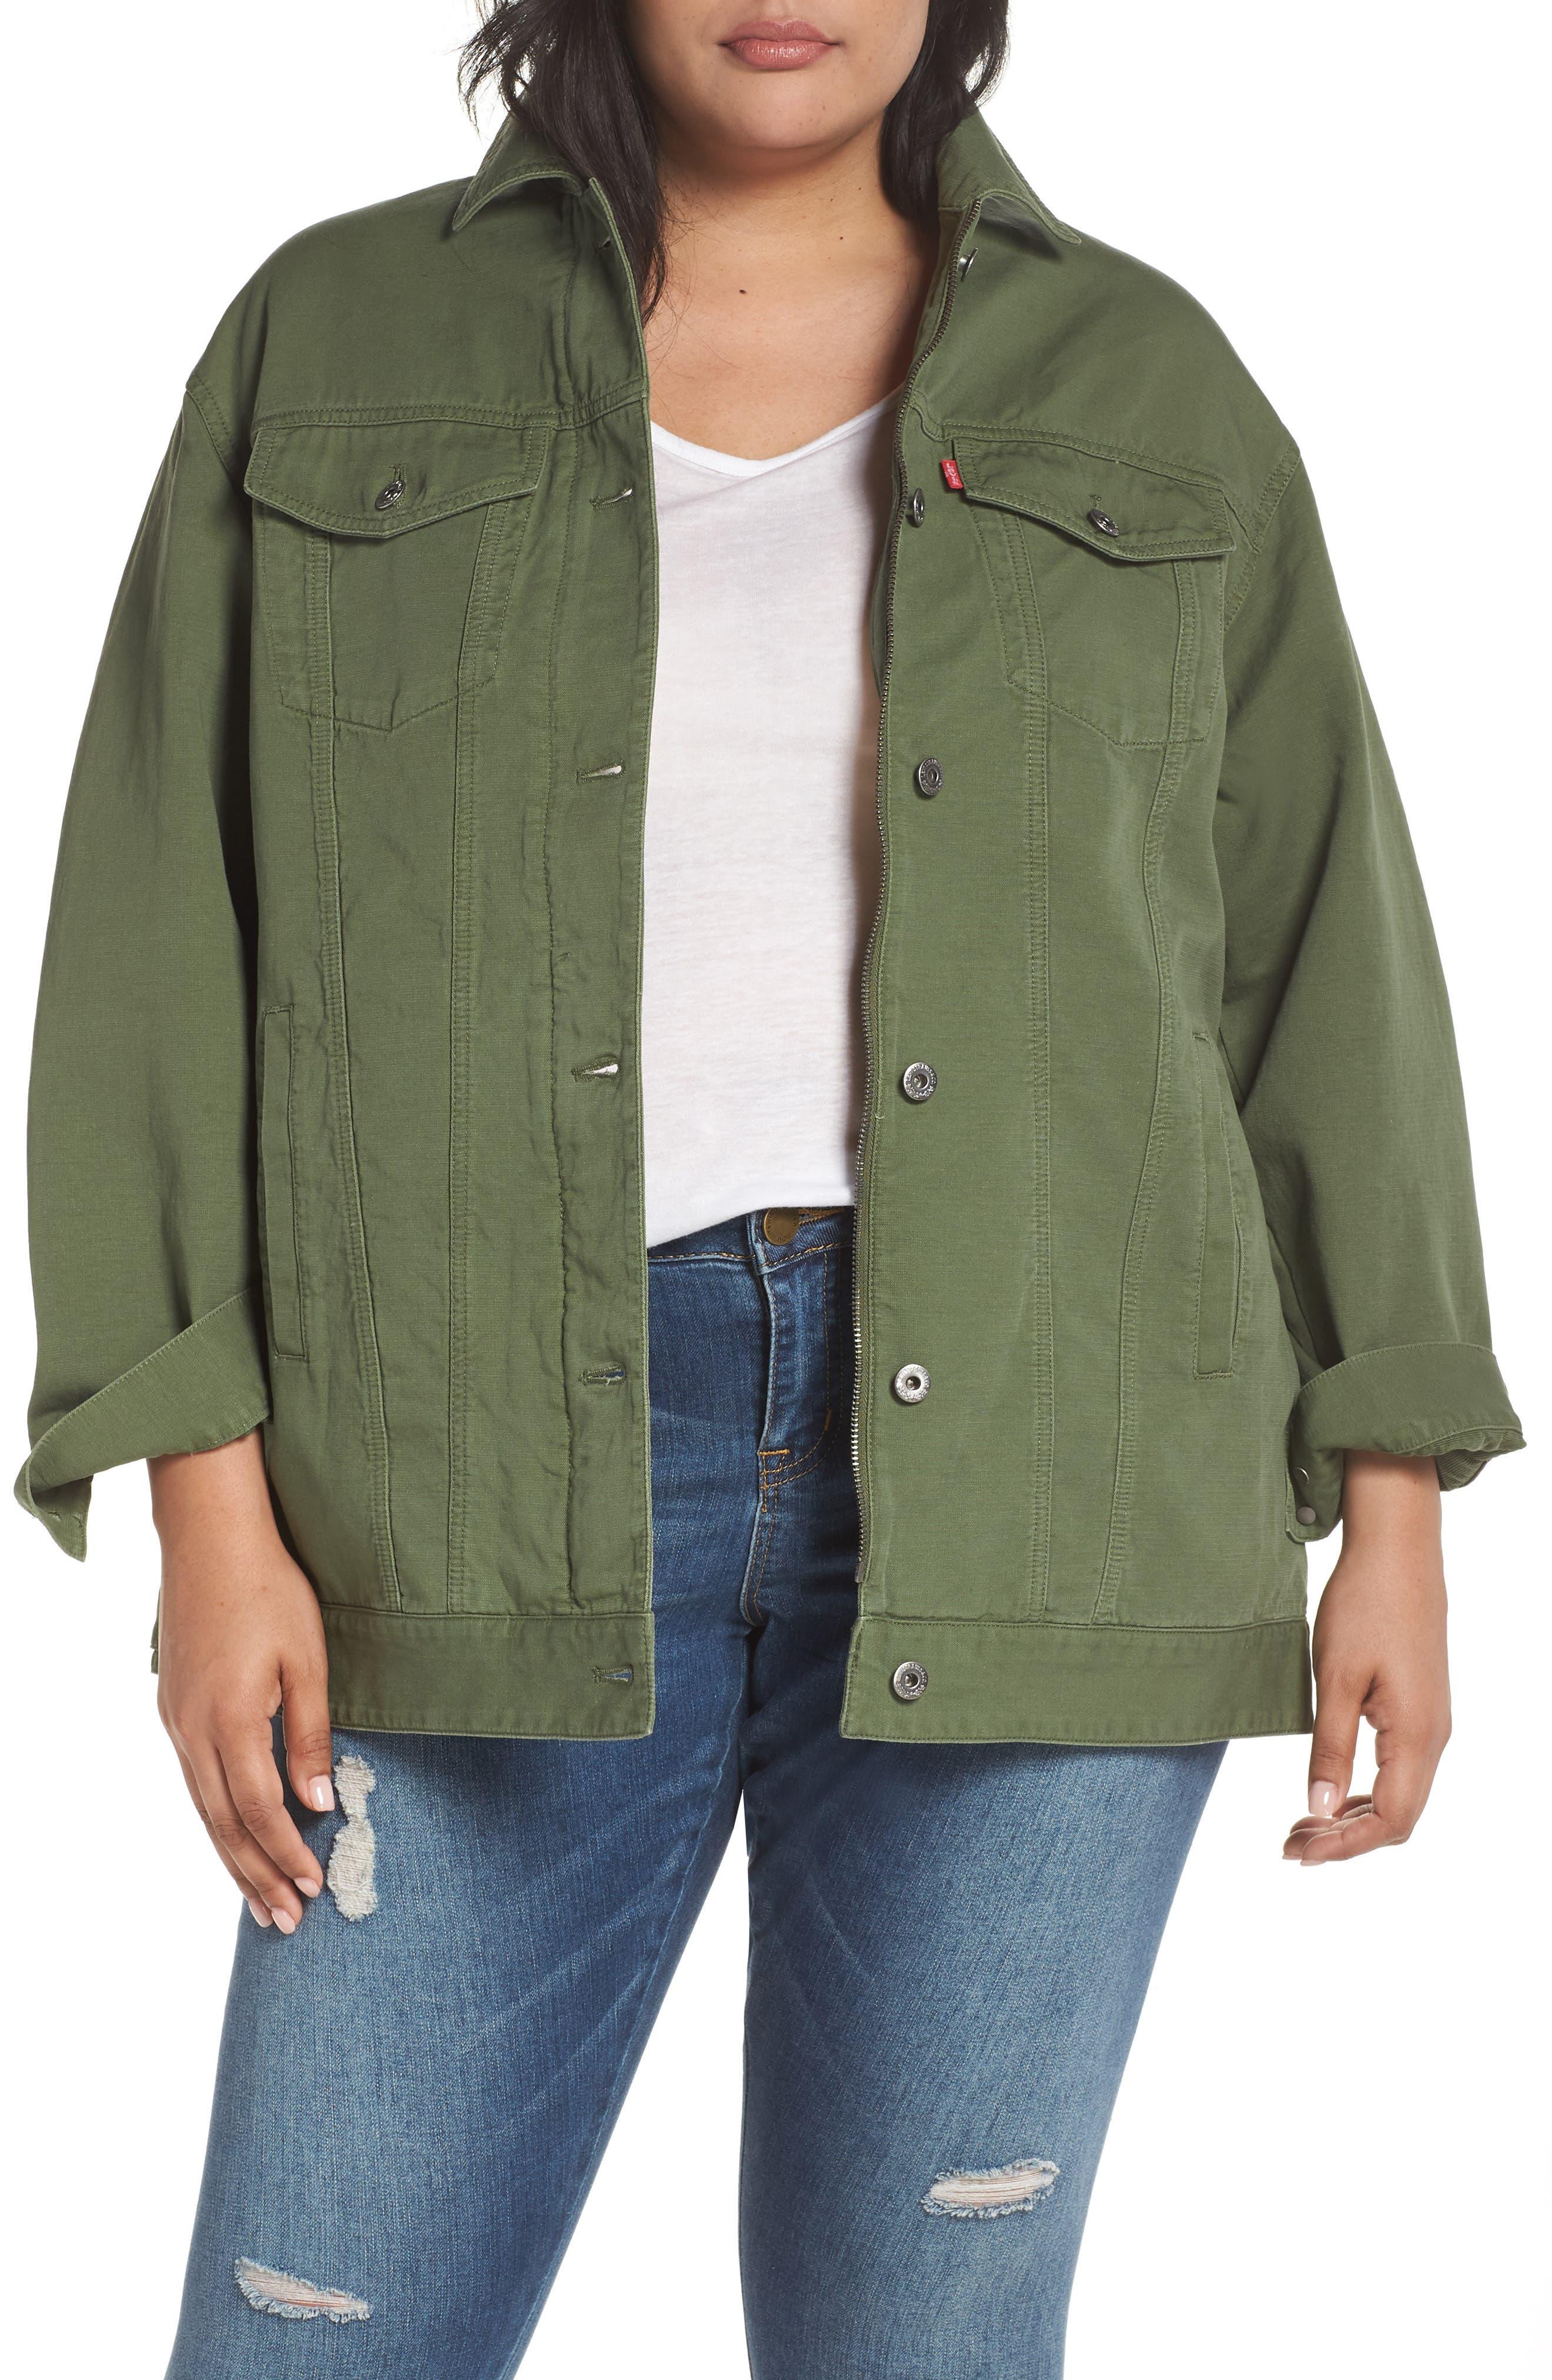 Alternate Image 1 Selected - Levi's® Oversize Cotton Canvas Trucker Jacket (Plus Size)